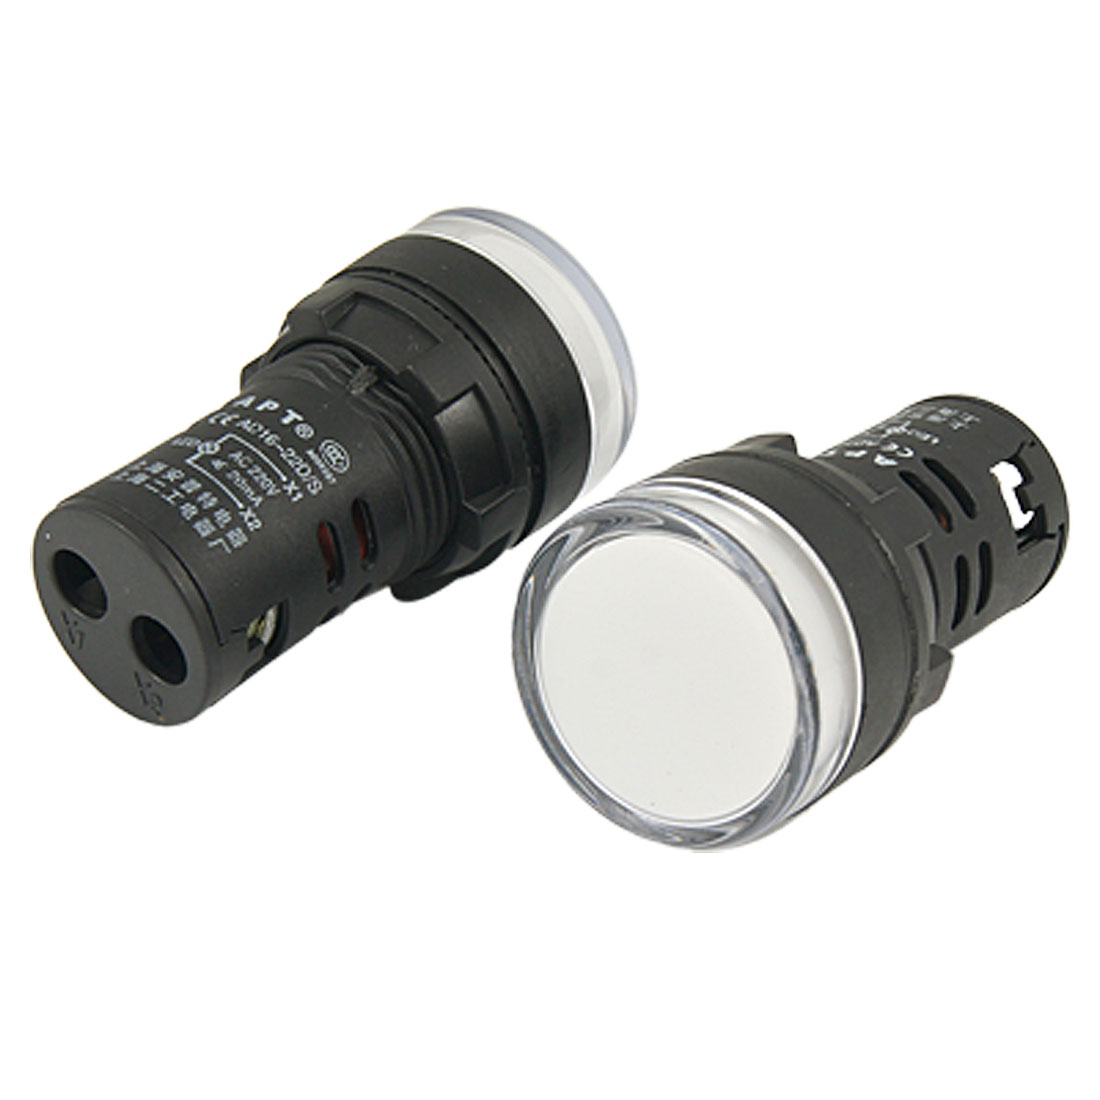 2 Pcs AC 220V White LED Light Signal Indicator for Electrical Circuit